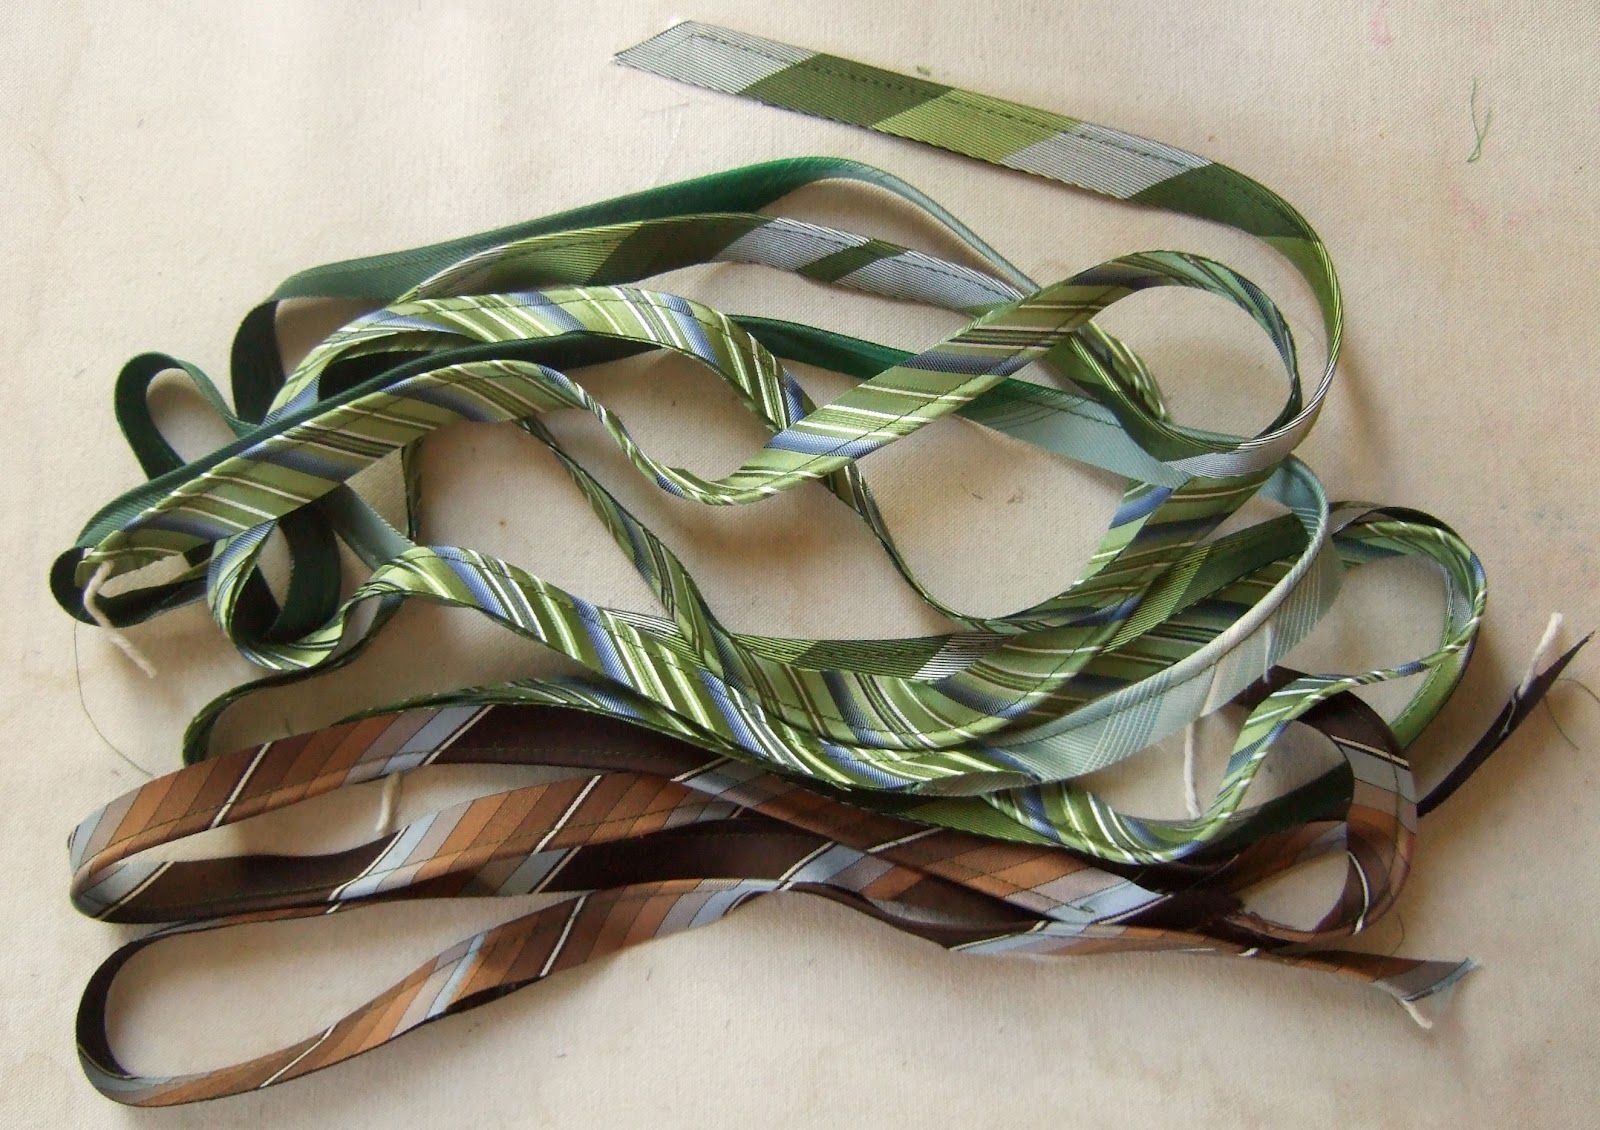 making bias piping form neckties! hahaahahhaa, great idea